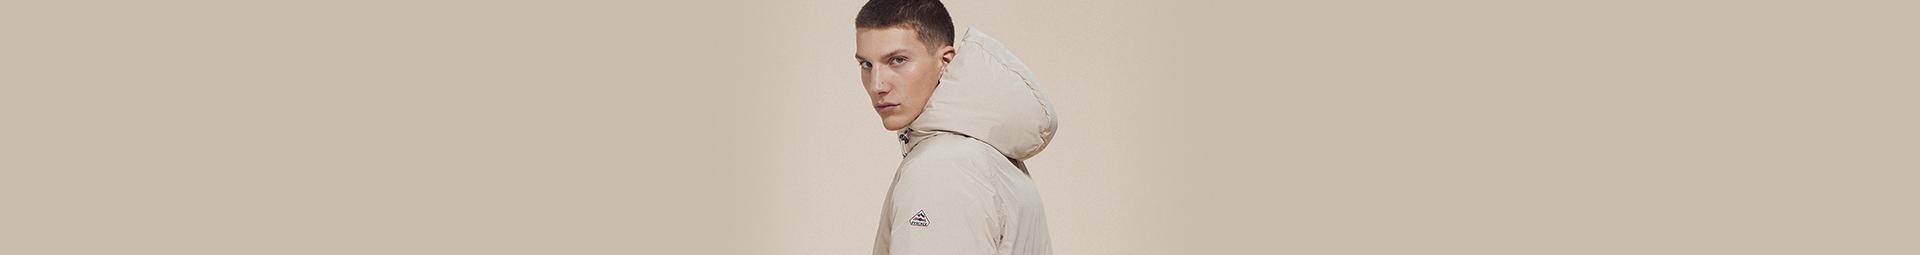 Mens parka jackets and warm winter coats | Pyrenex